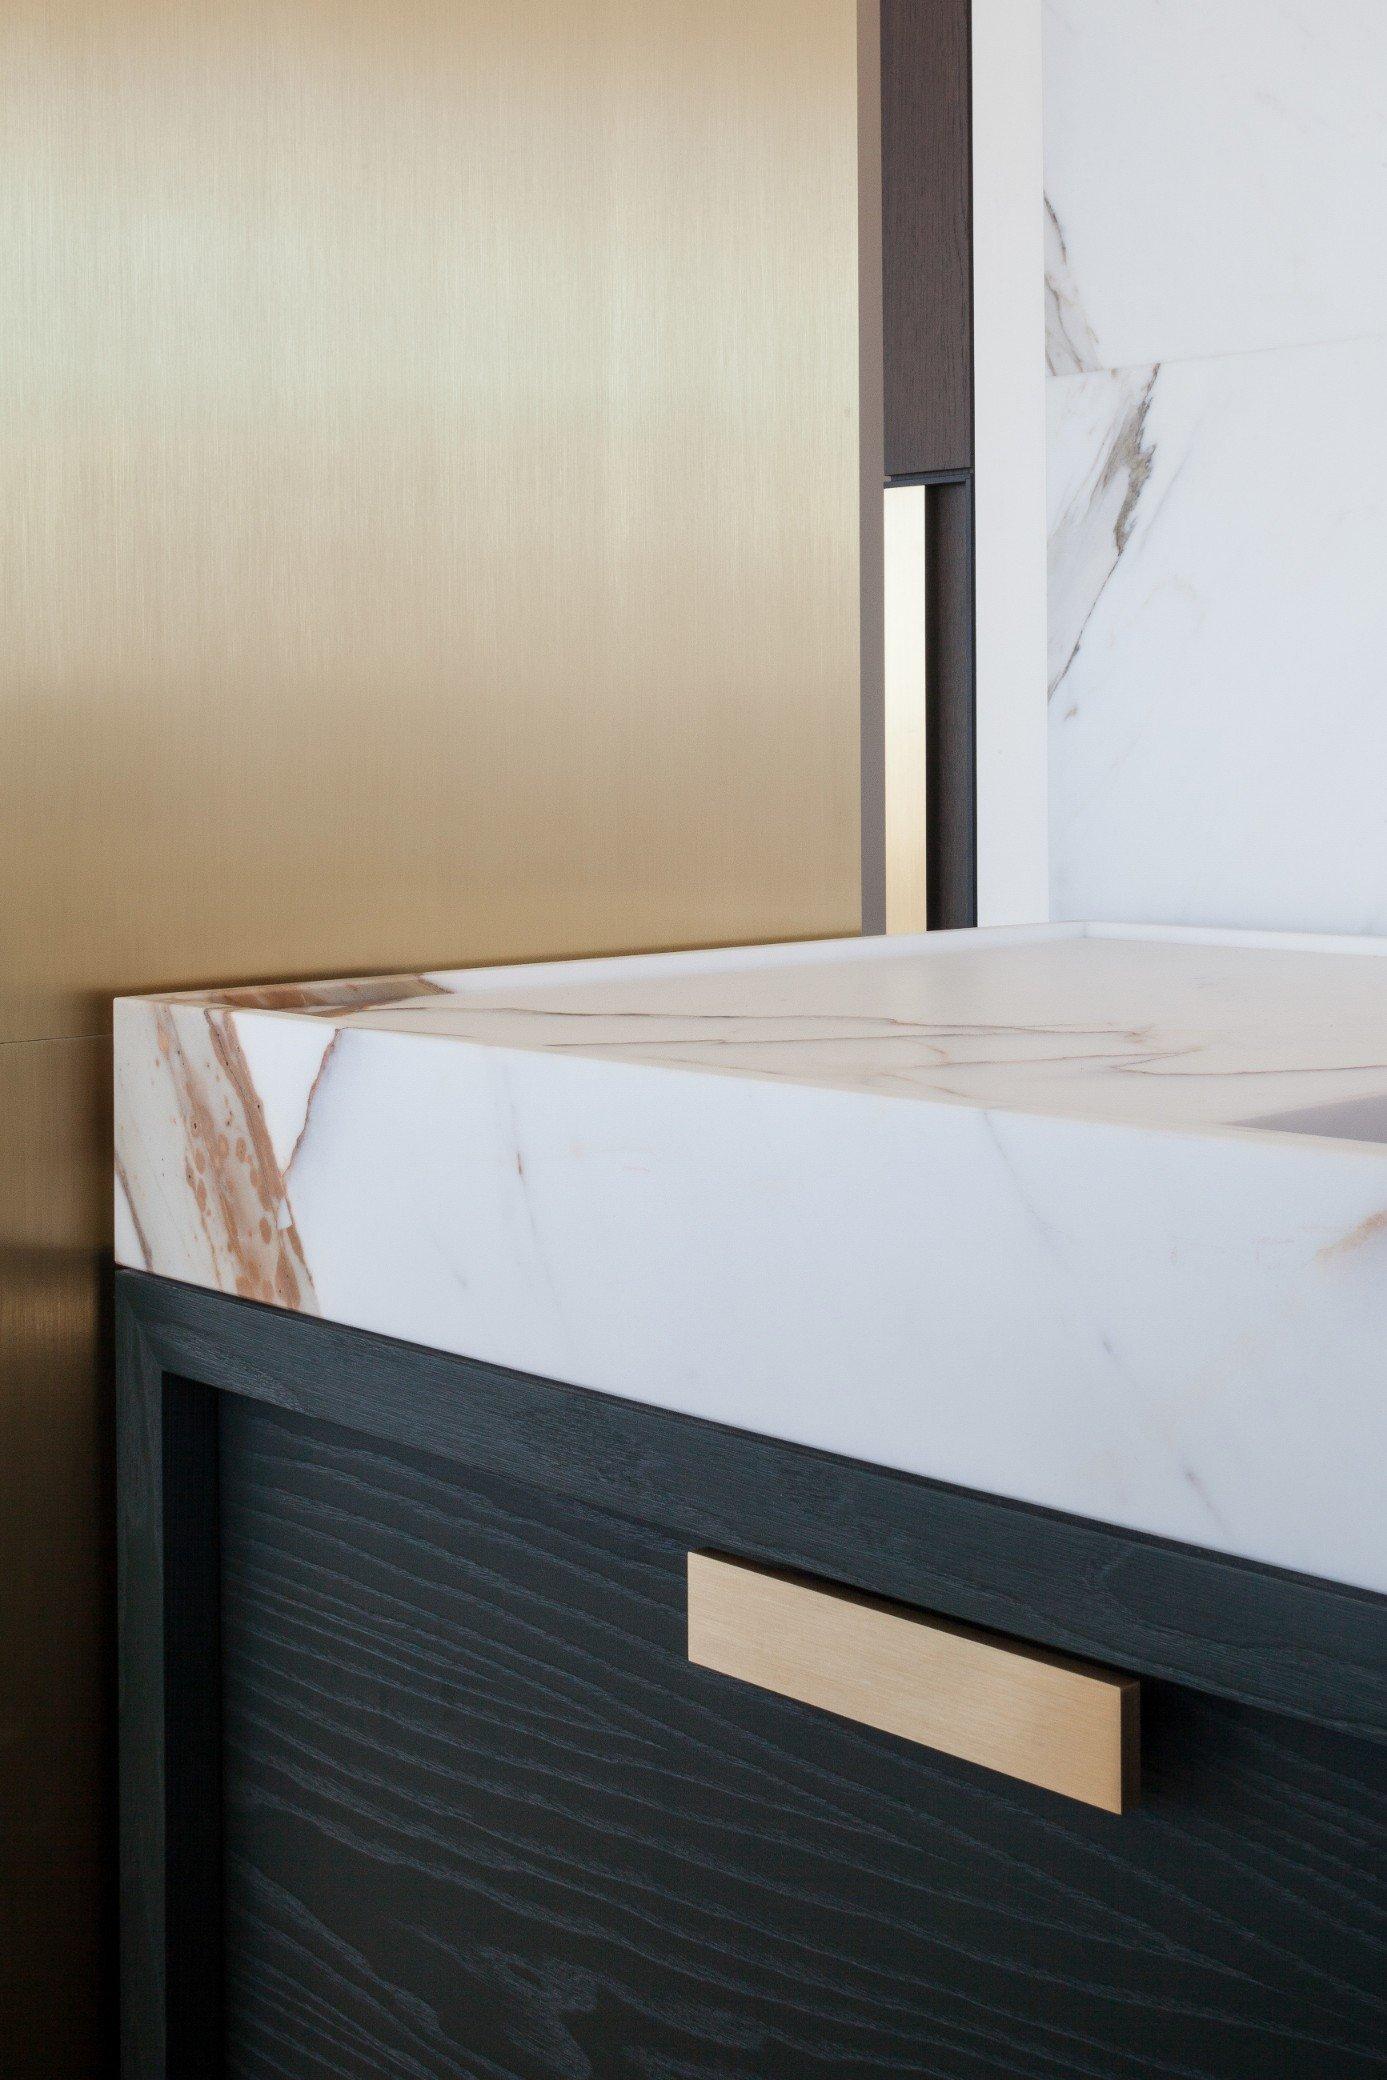 Rietveldprojects-penthouse-appartement-design-architectuur-kust36